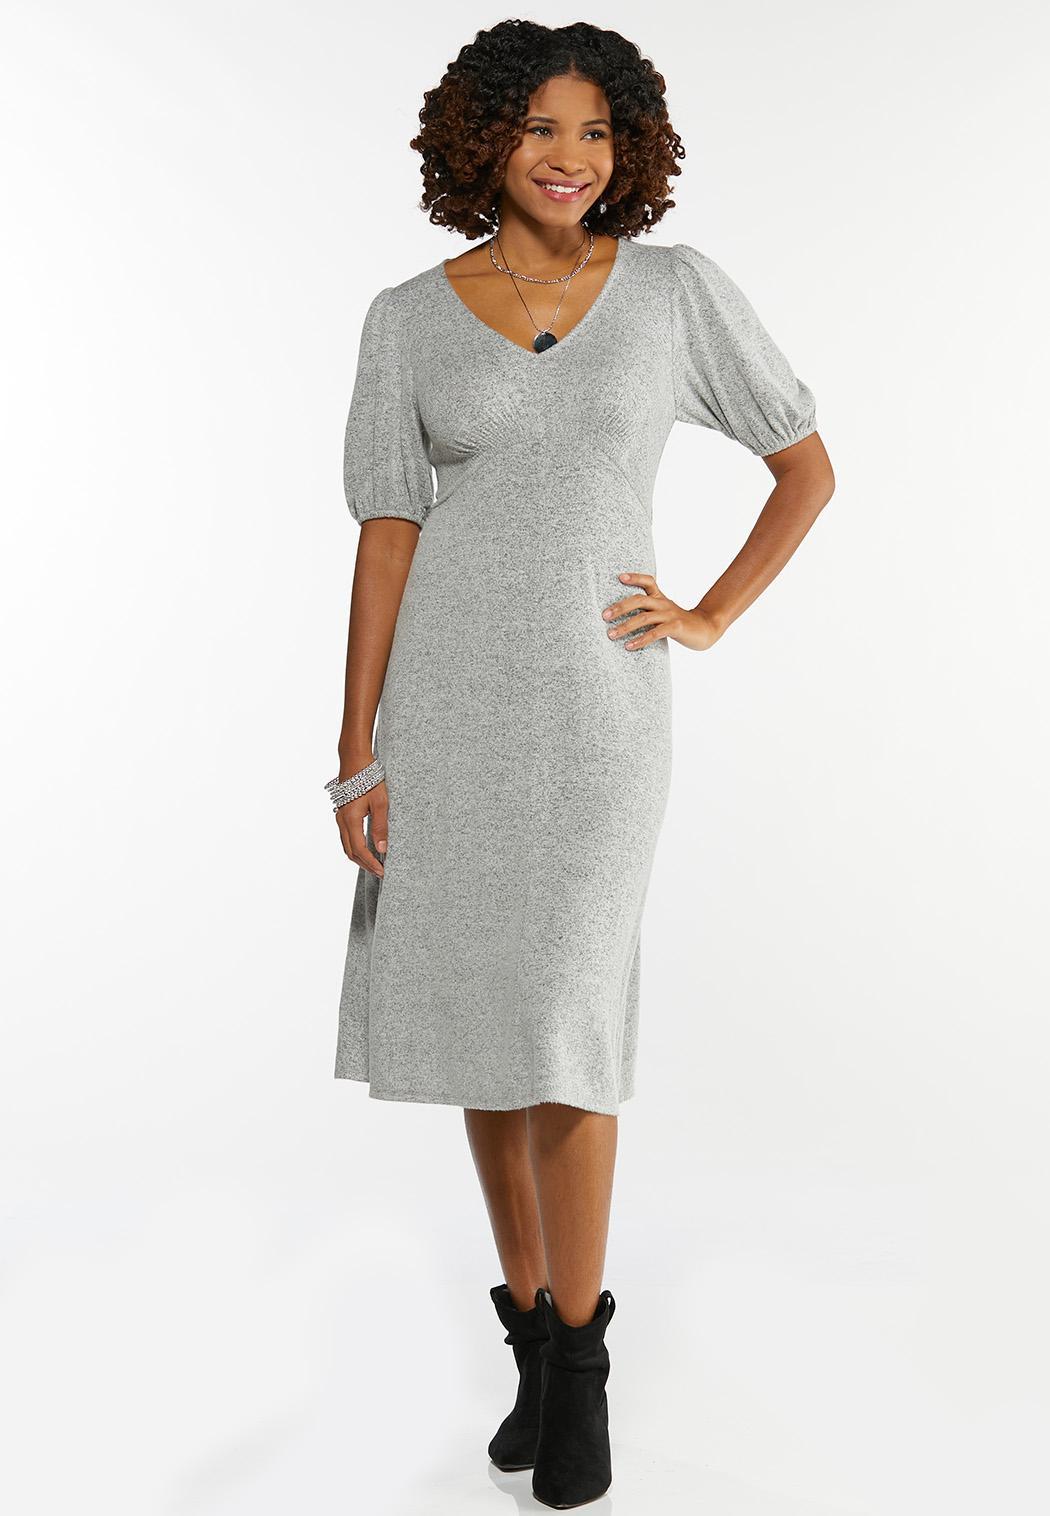 Gray Balloon Sleeve Dress